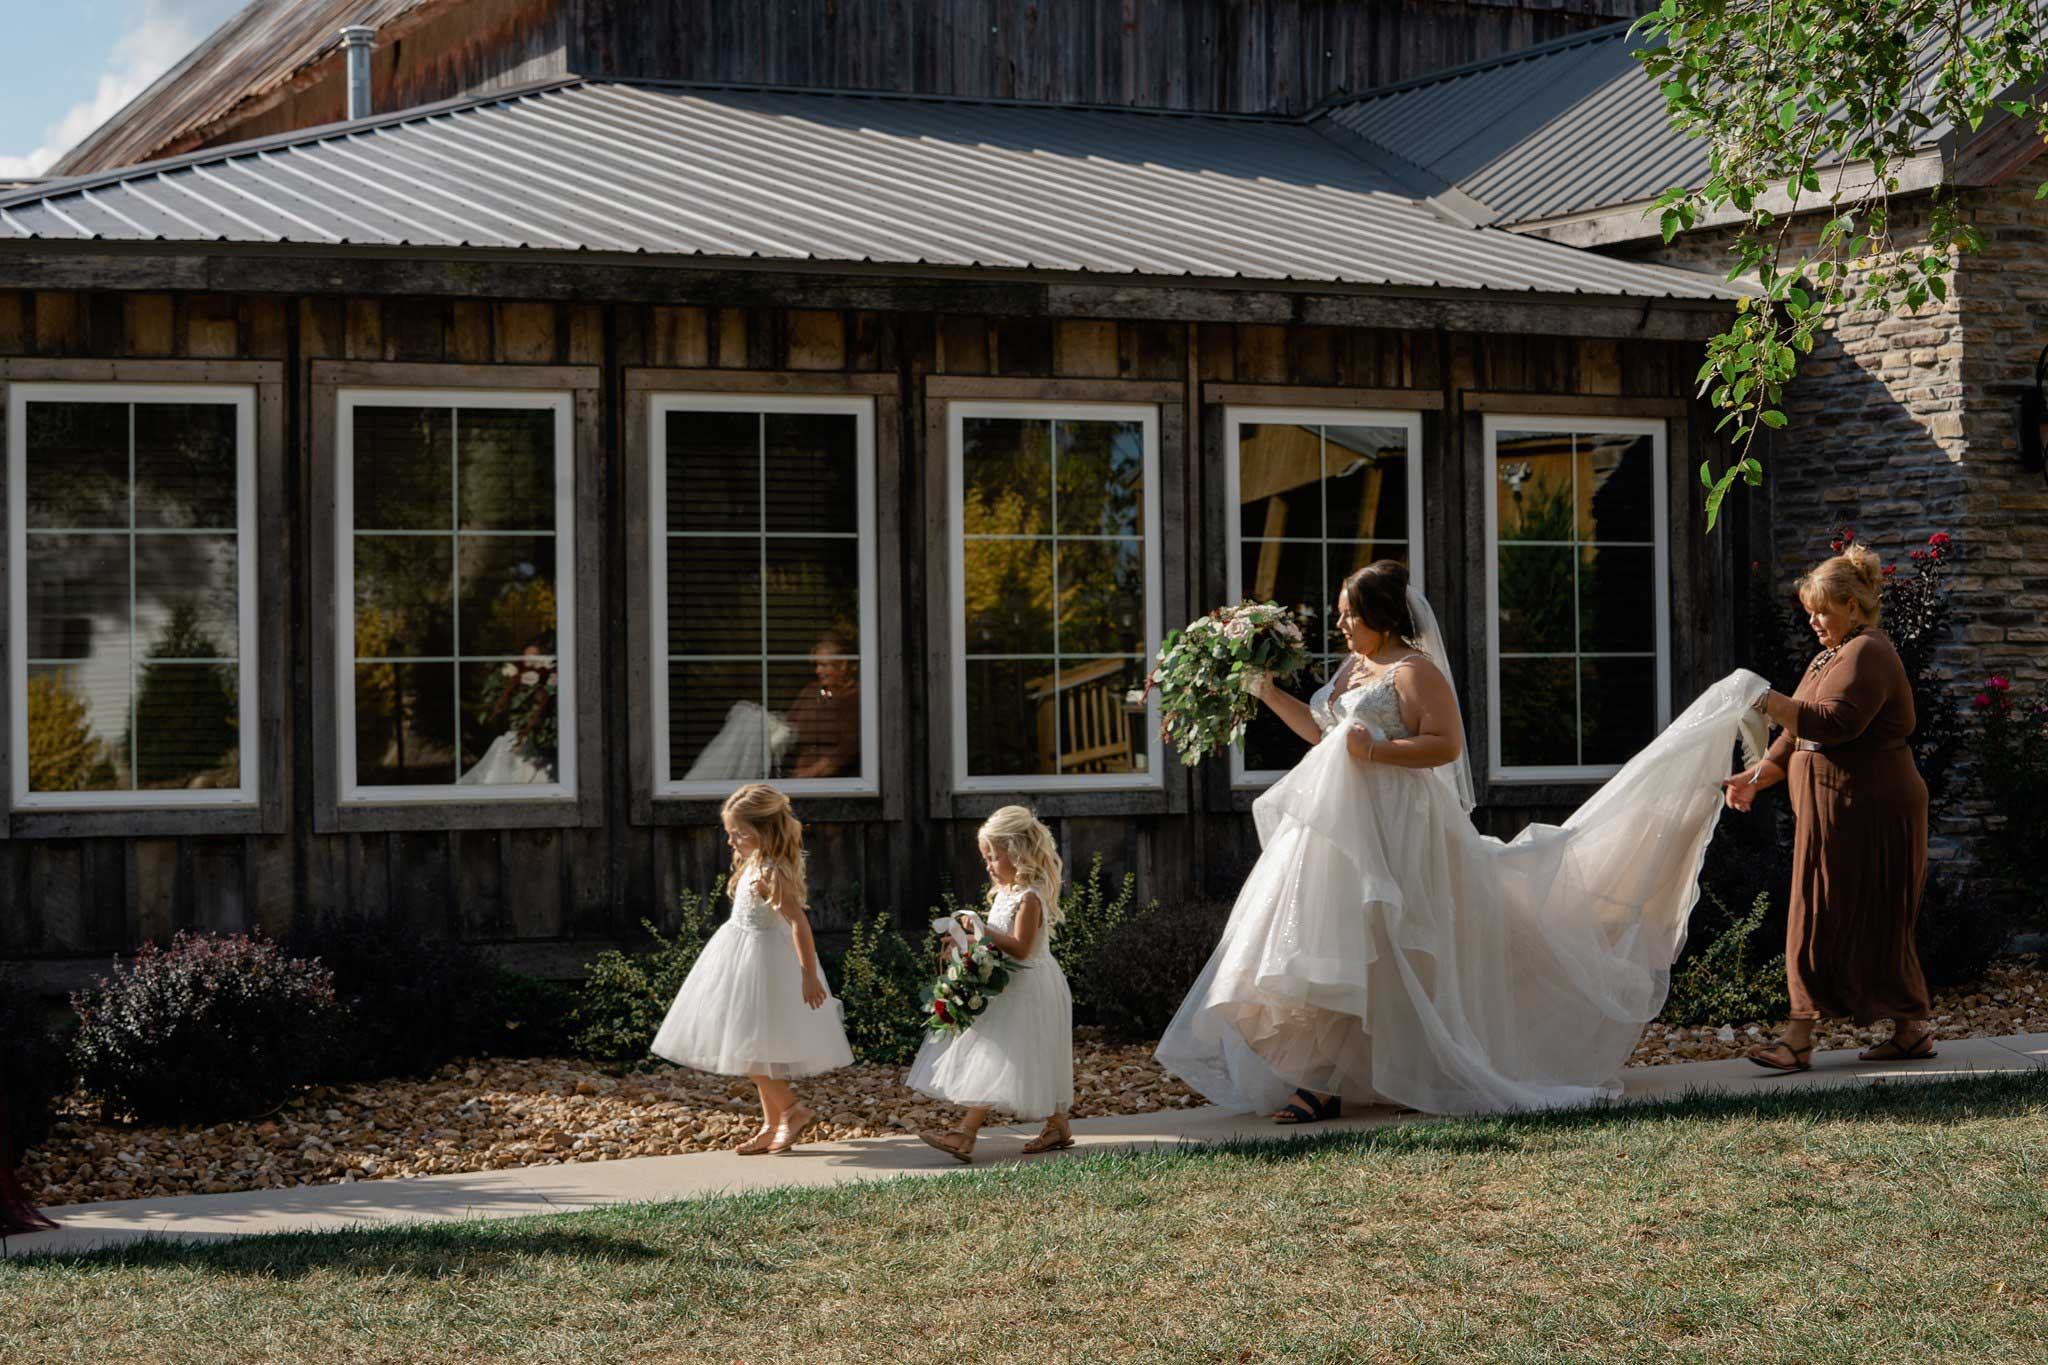 Belamour Springfield Wedding Venue